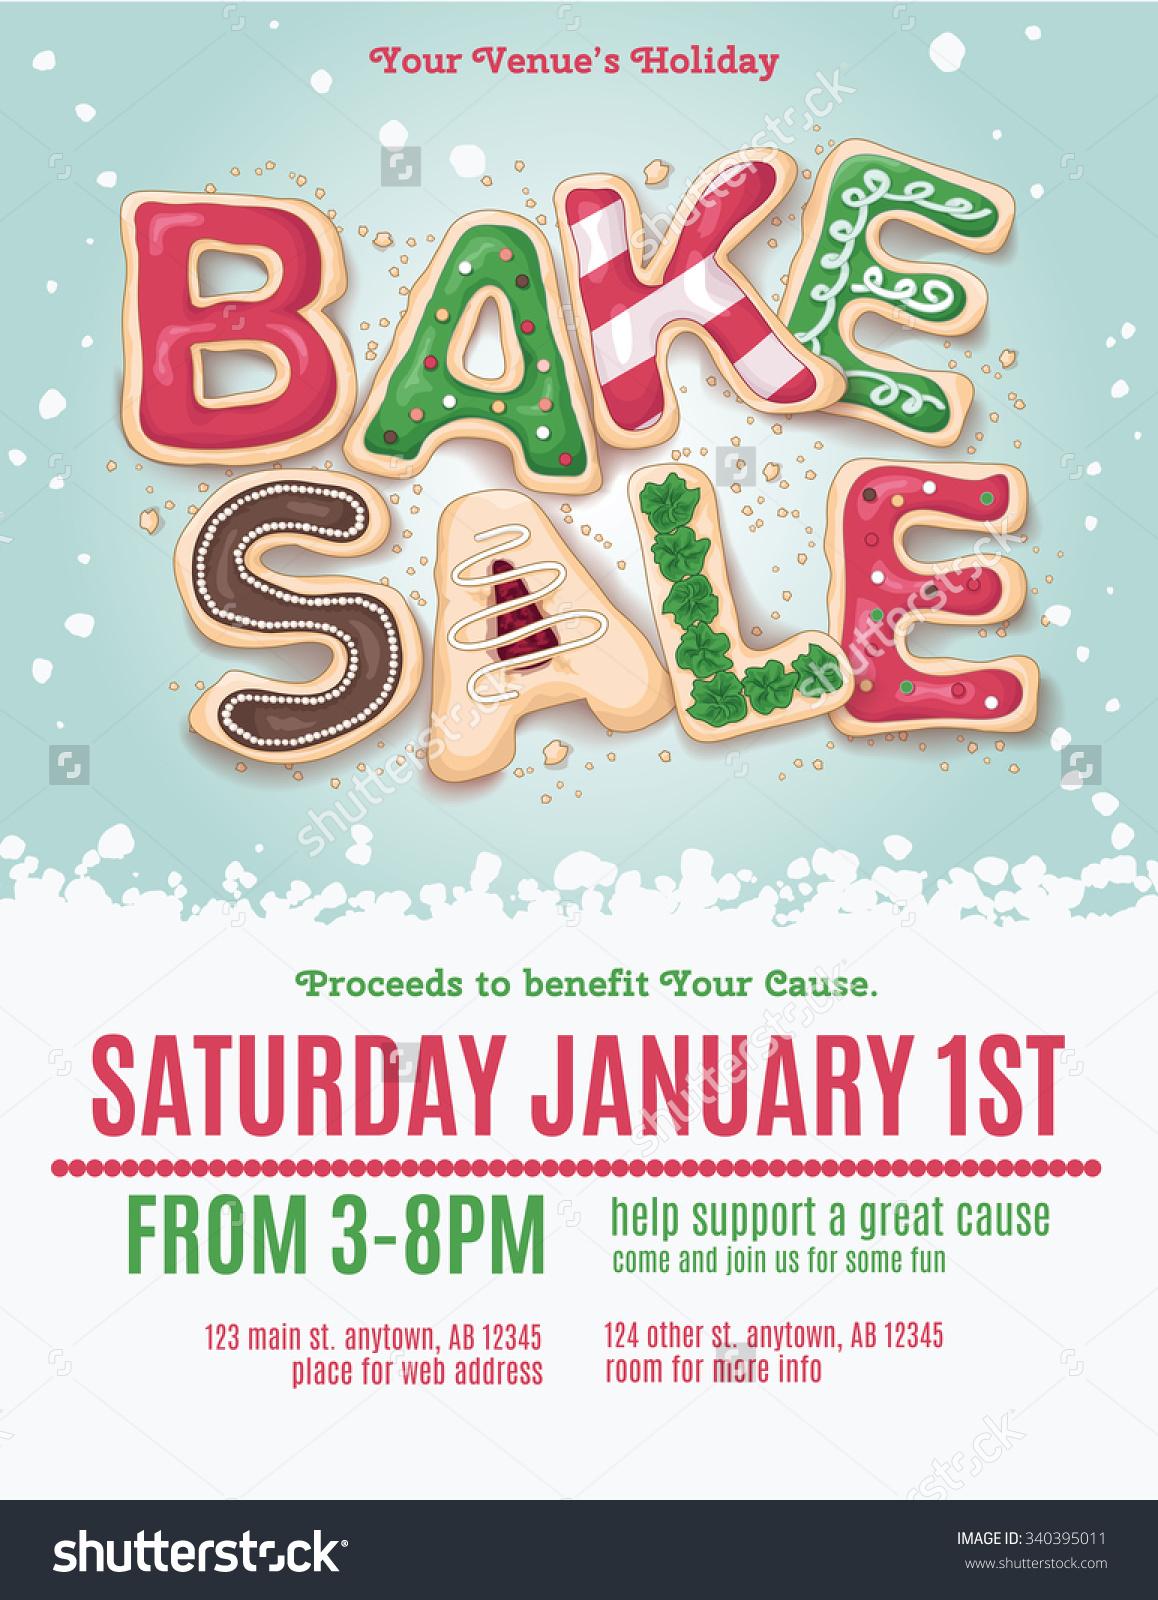 Holydays clipart bake sale Sale clipart bake Free bake